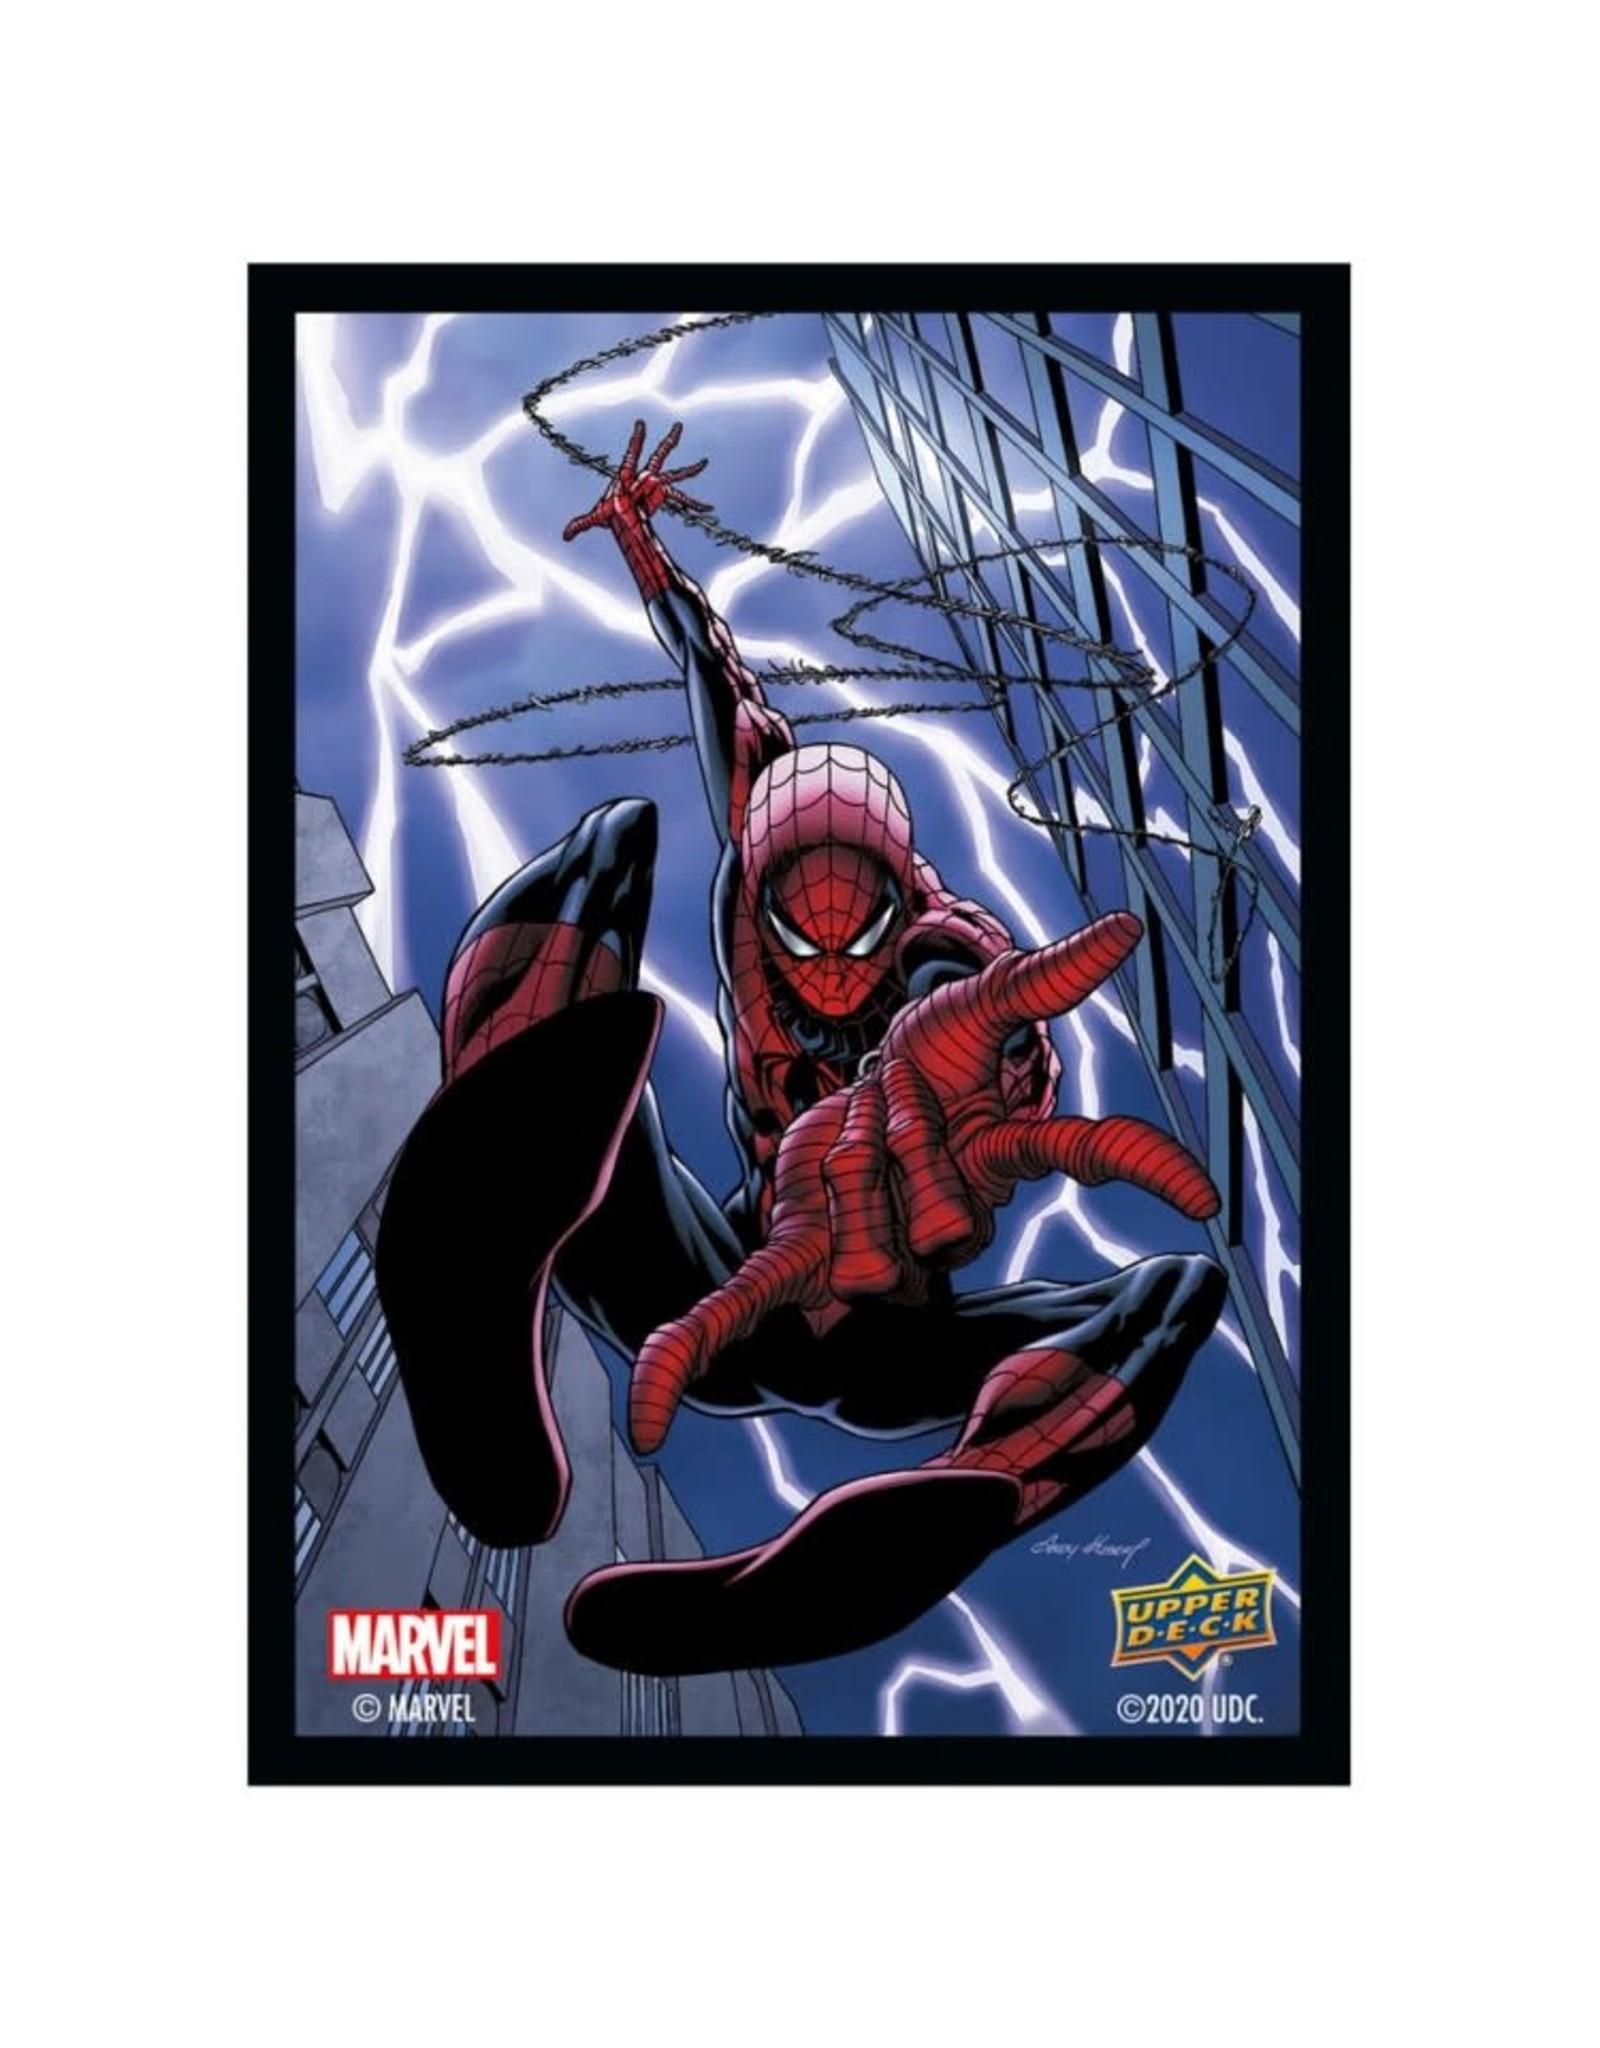 Upper Deck Marvel Sleeves: Spider-man (65)